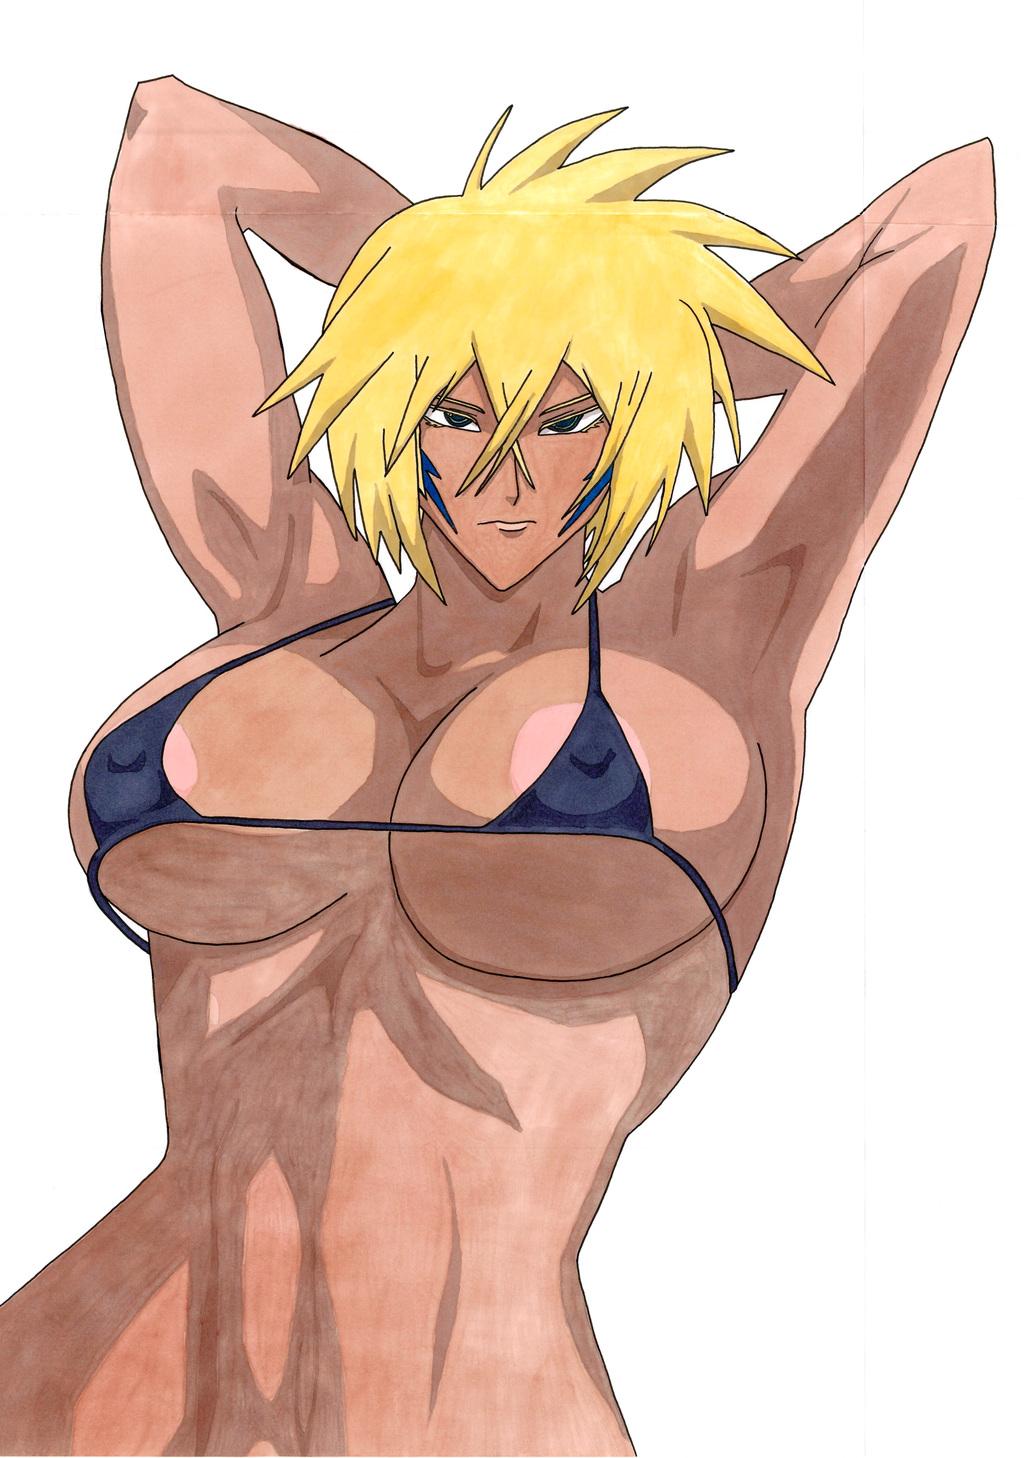 Most recent image: Bikini Harribel